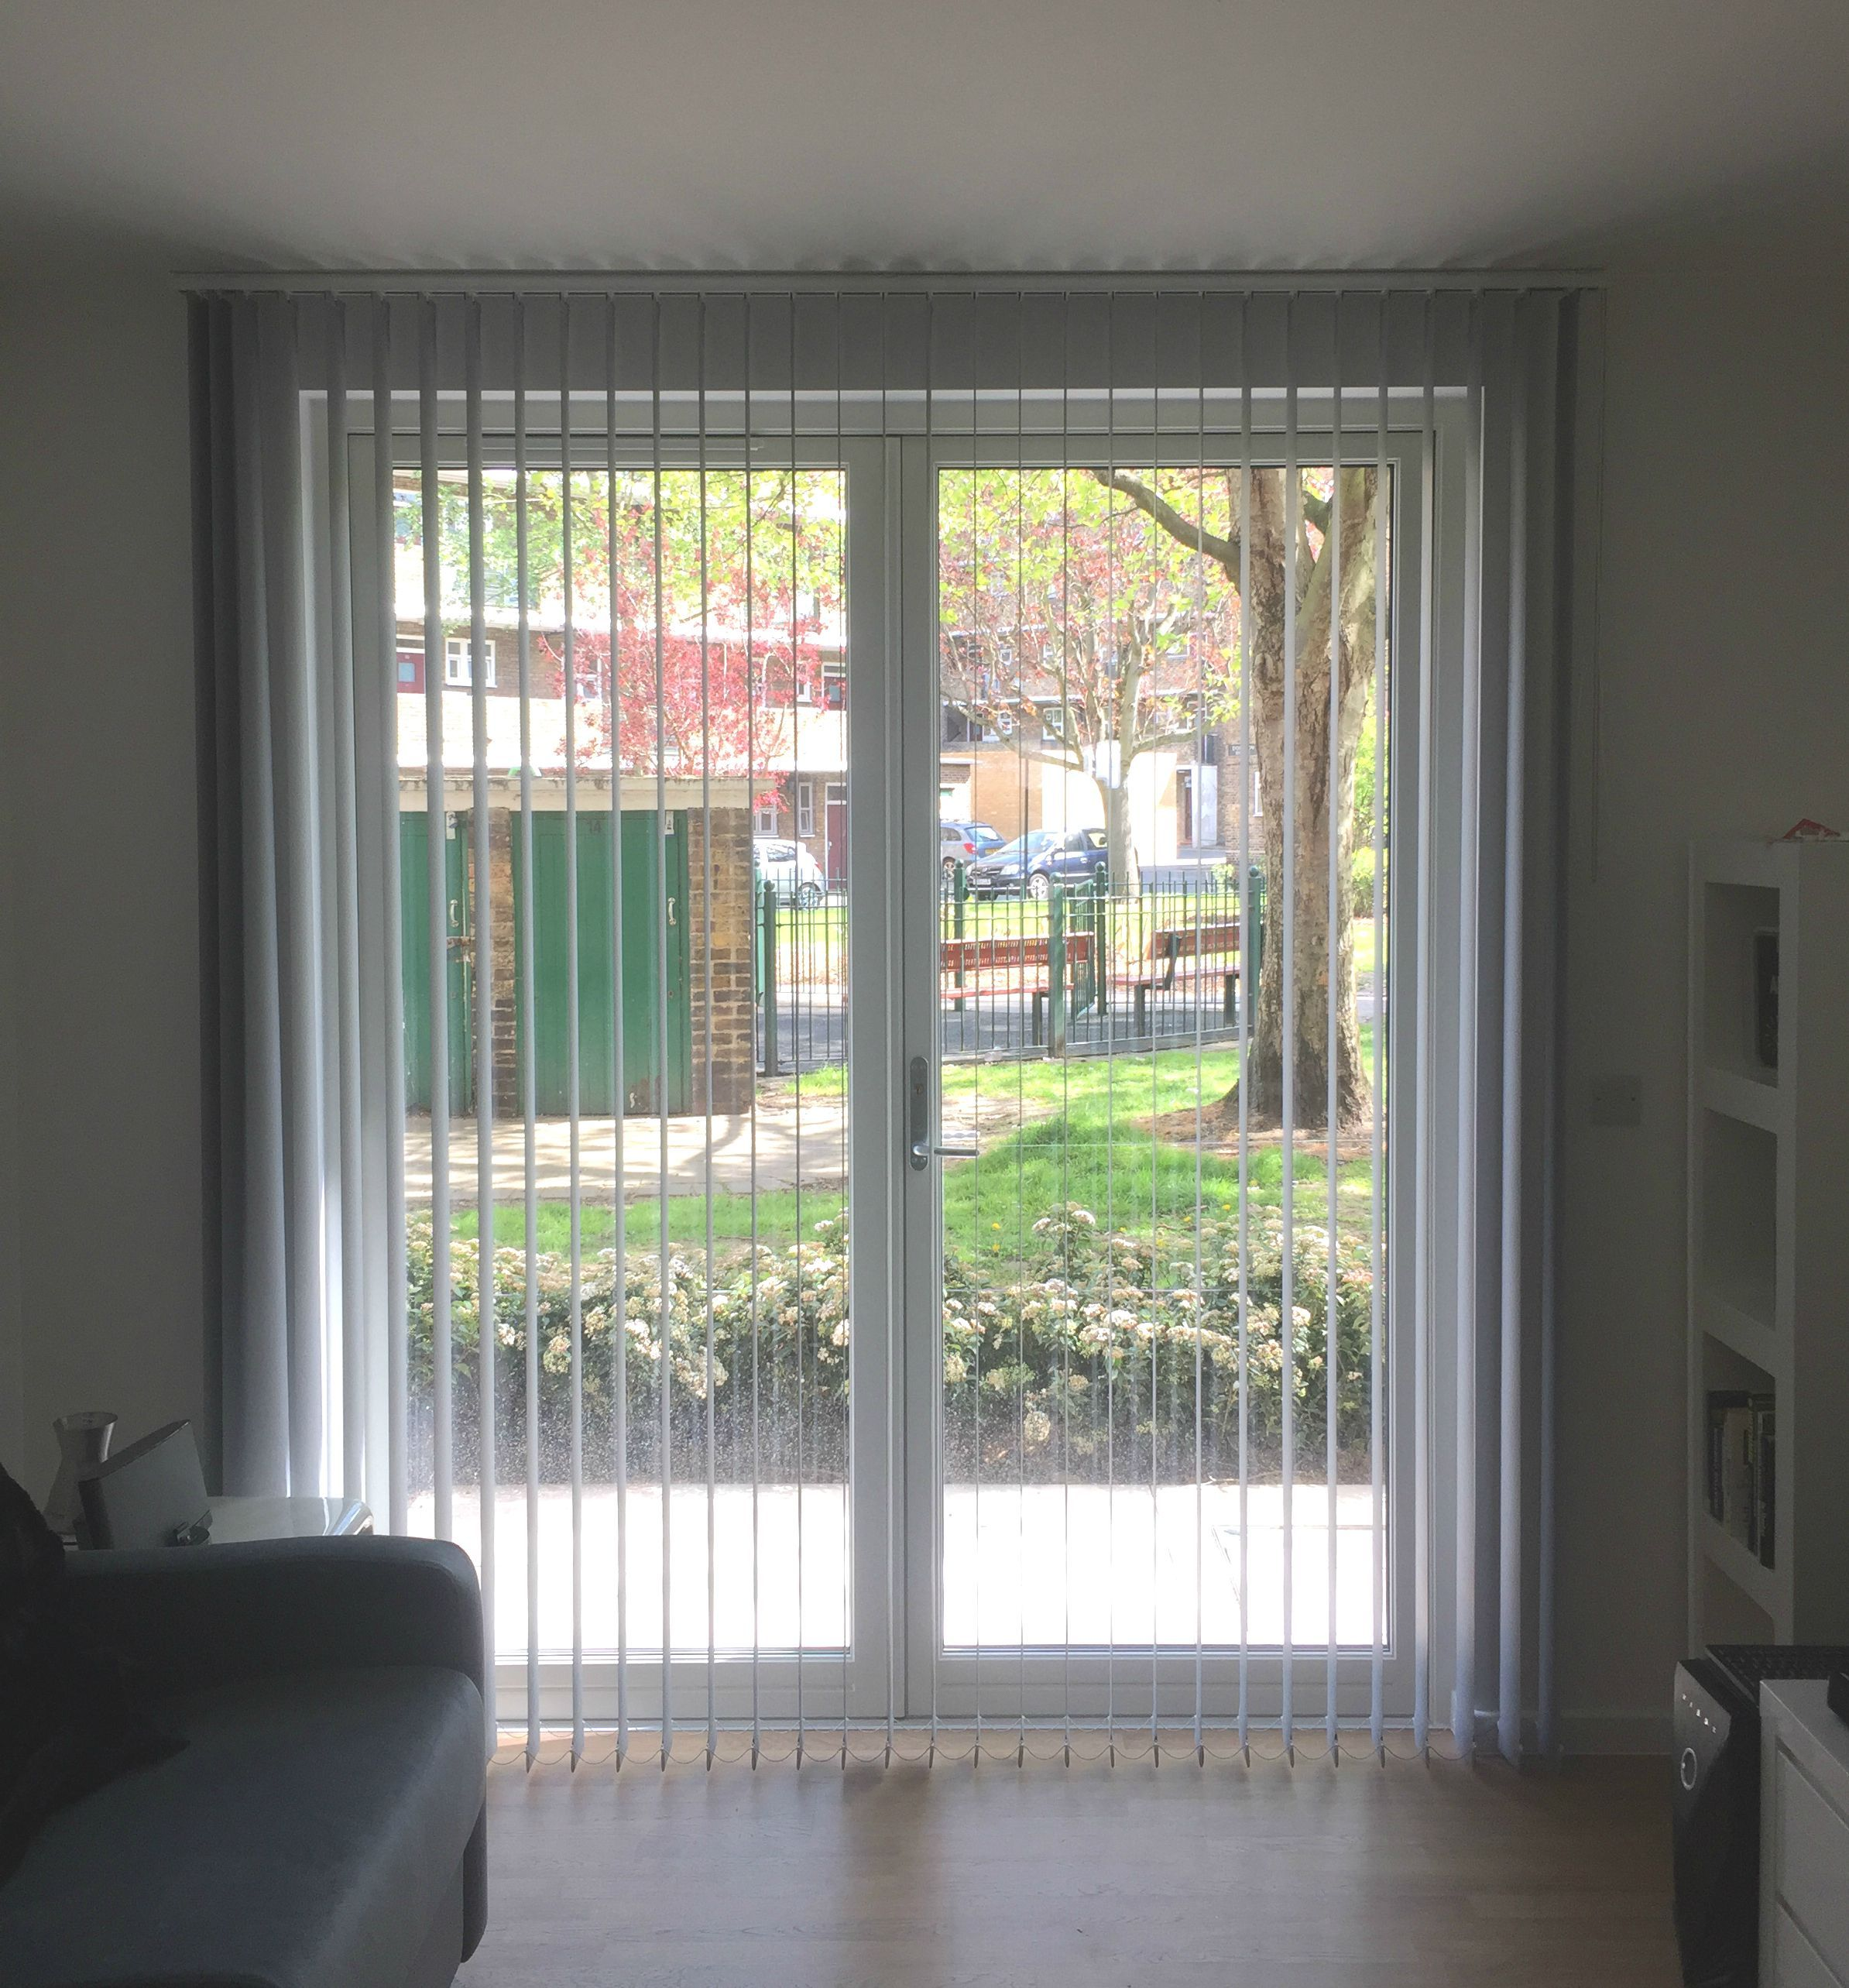 Office window coverings   marvelous diy ideas outdoor blinds waterproof grey blinds wood